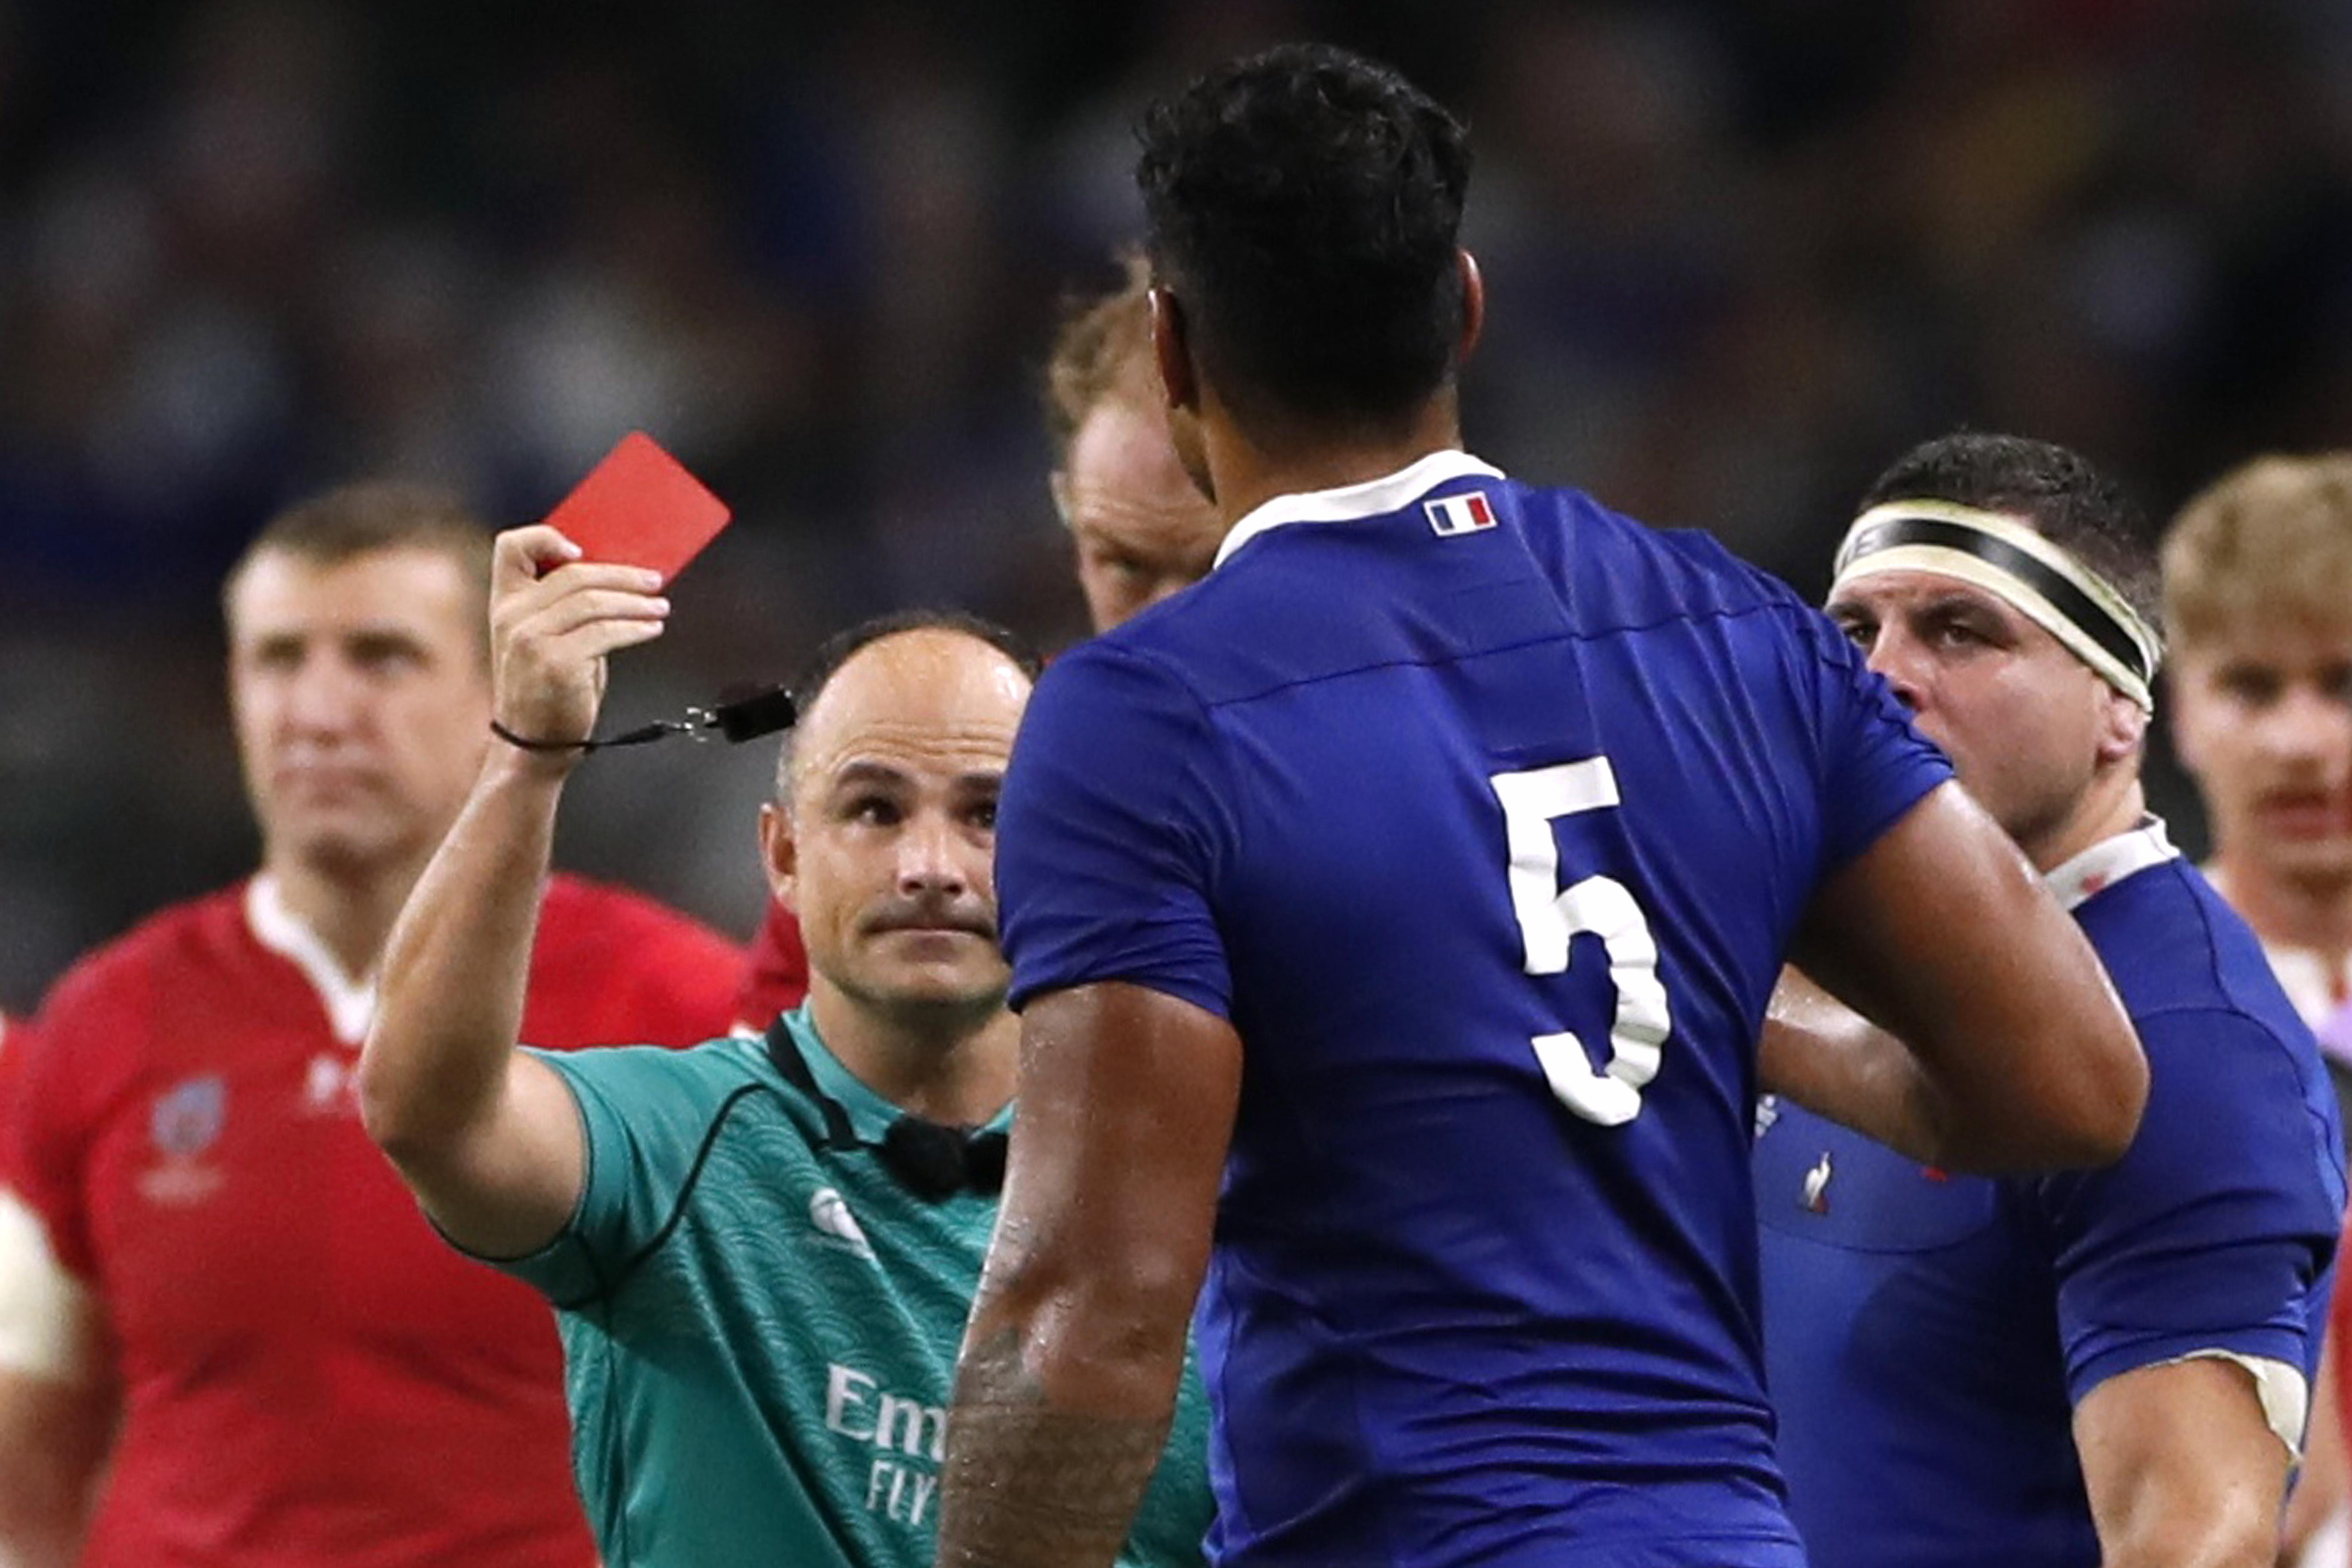 Rugby - Coupe du monde 2019 - Vahaamahina, indéfendable mais défendu